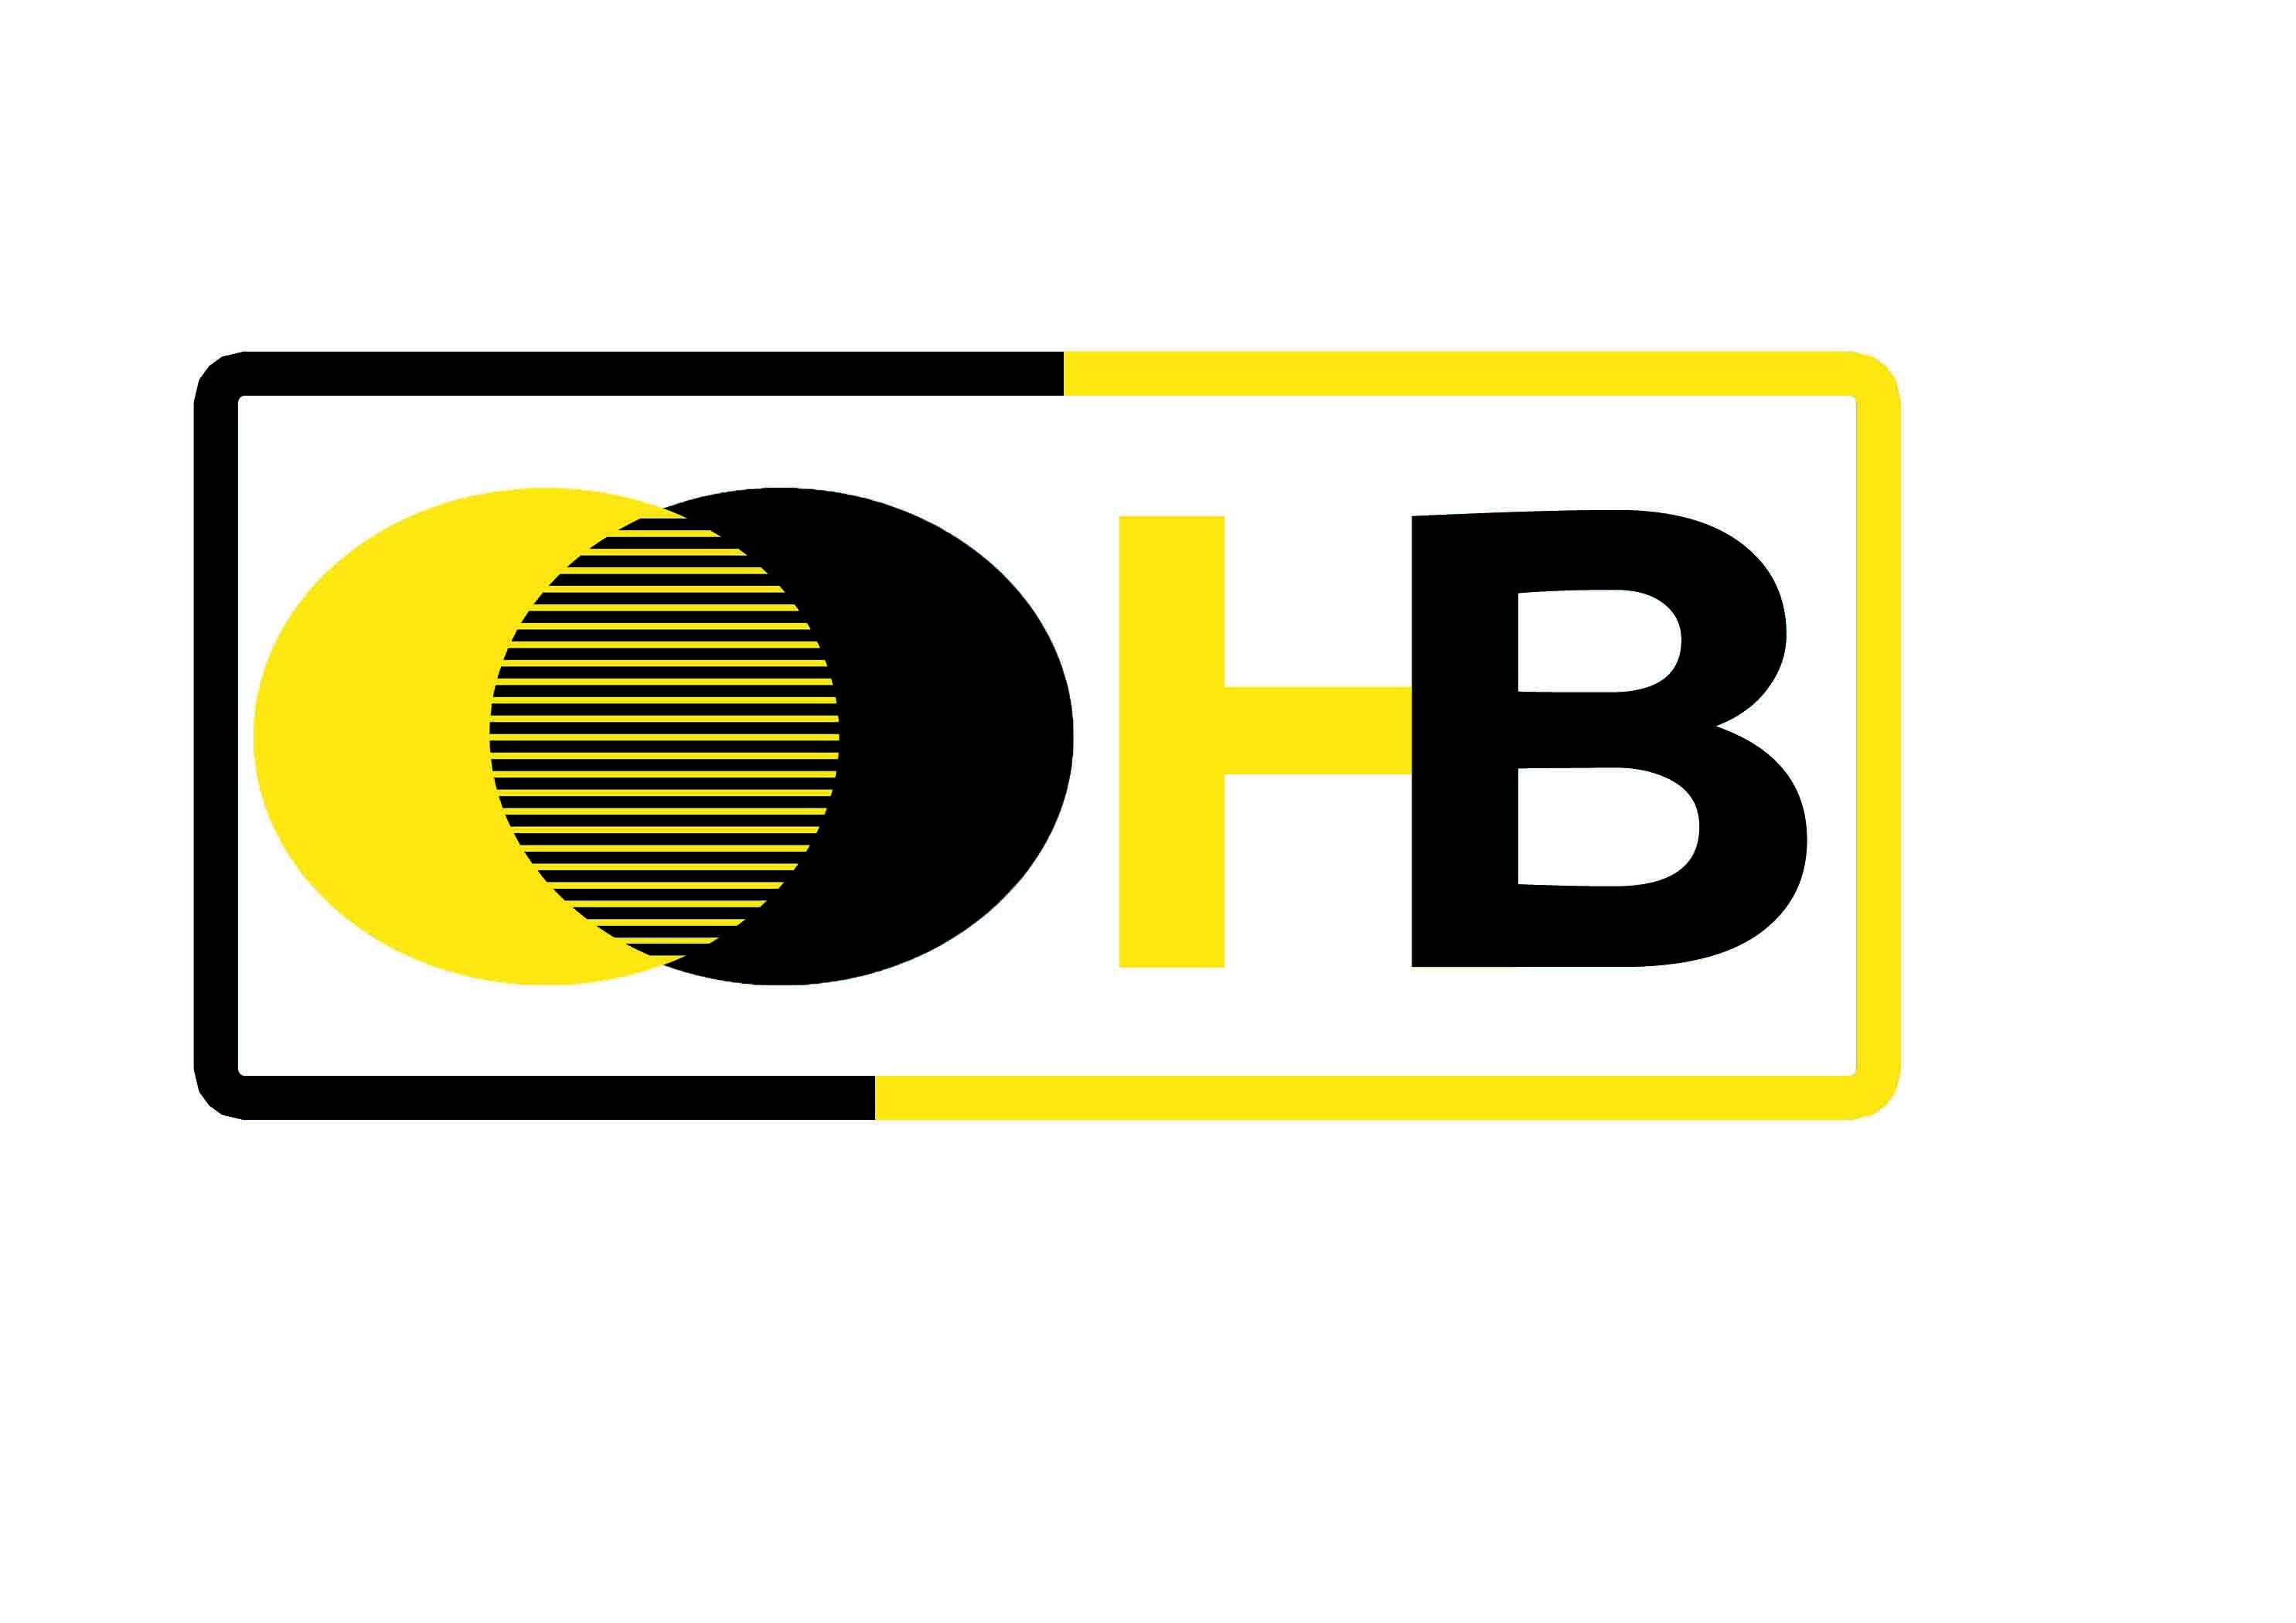 Логотип компании по перевозкам НосимВозим фото f_4205cfe1db2ae2ae.jpg